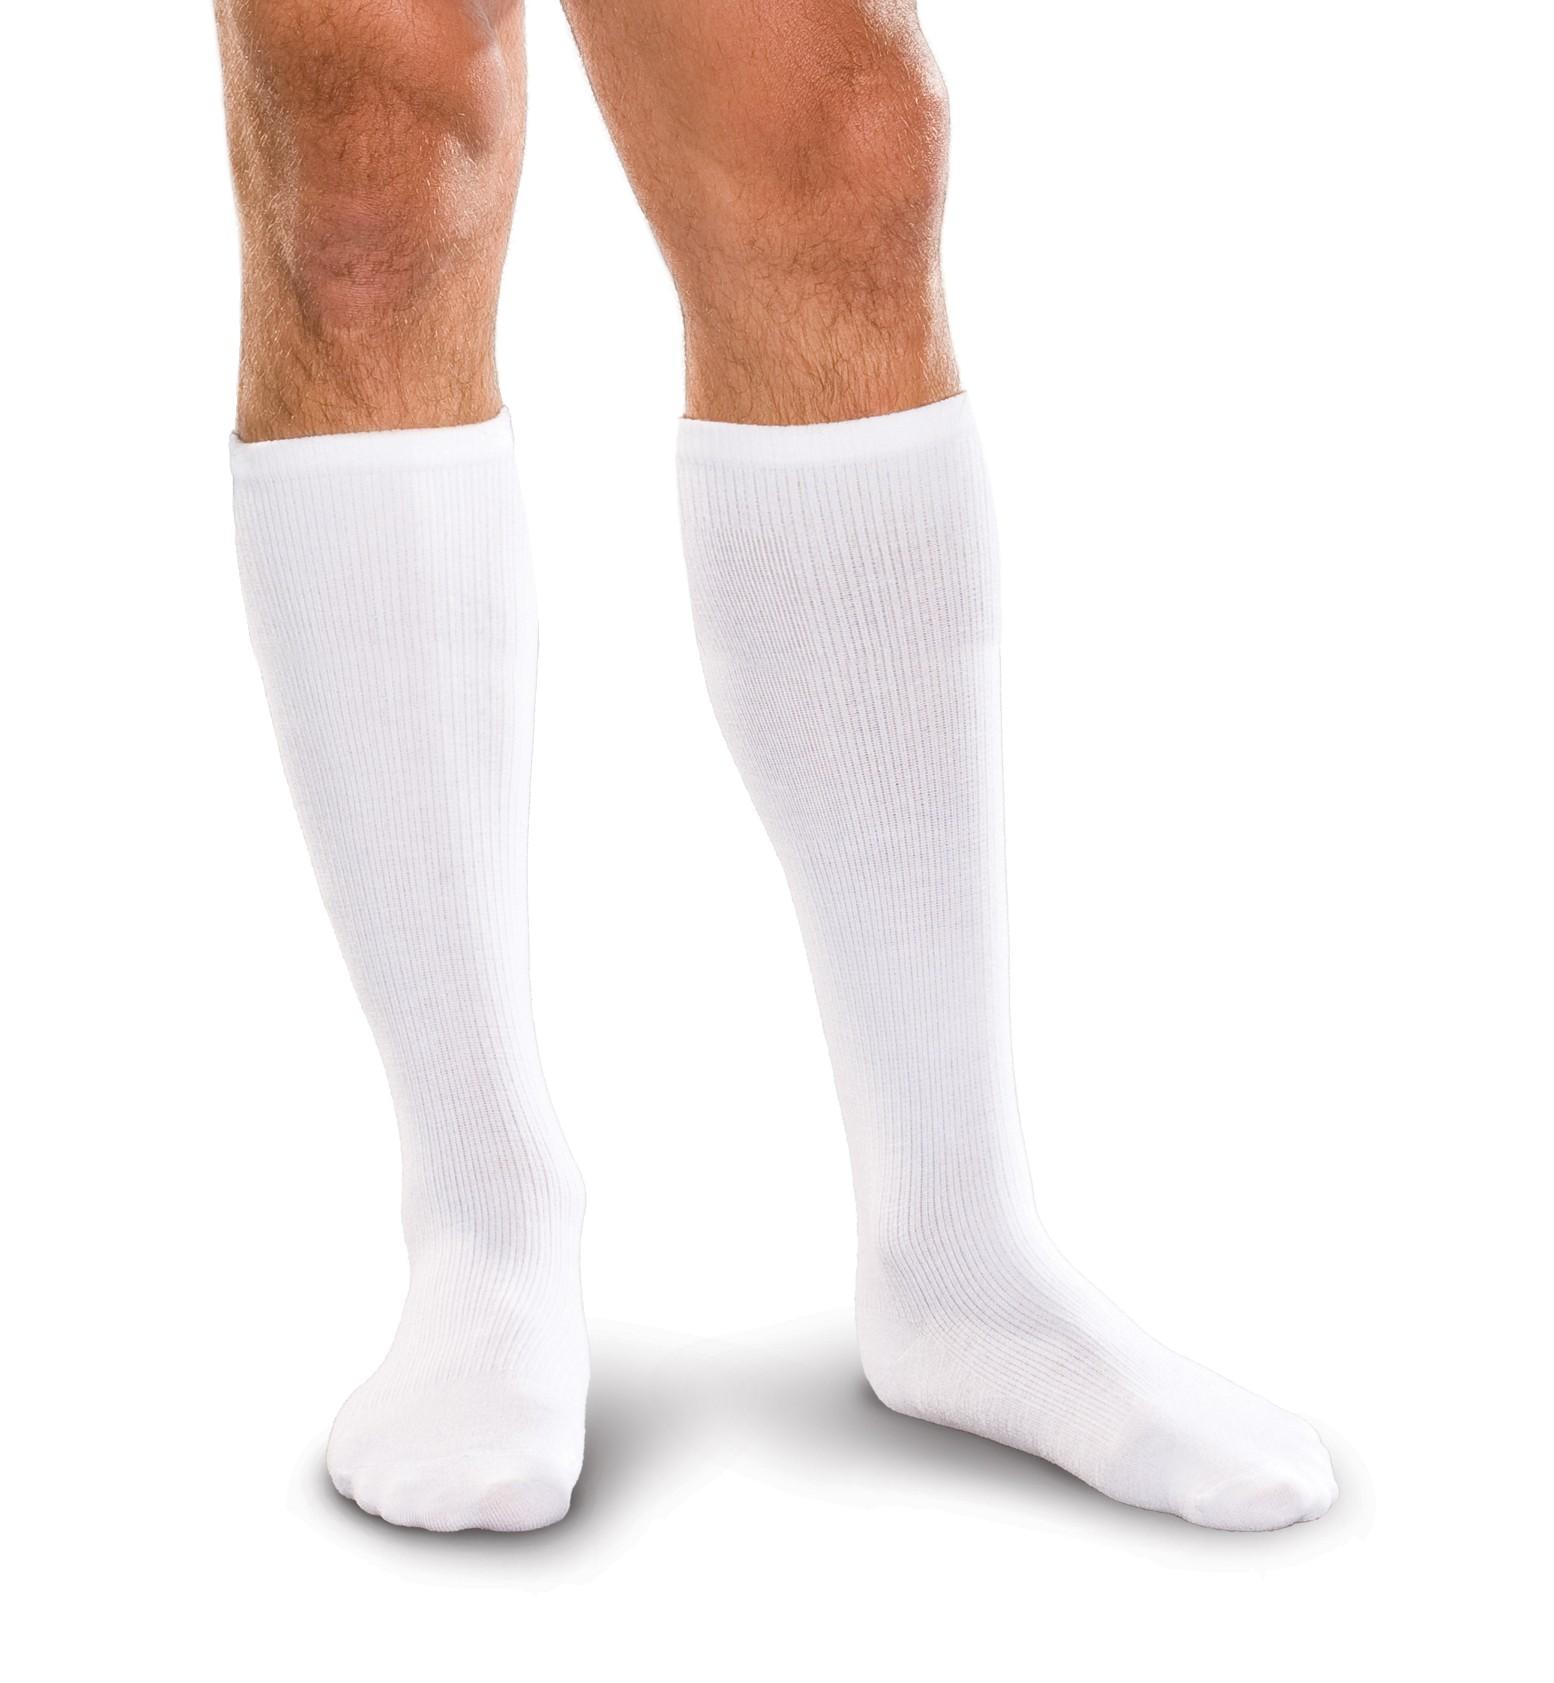 Therafirm_core-spun-compression-socks.jpg